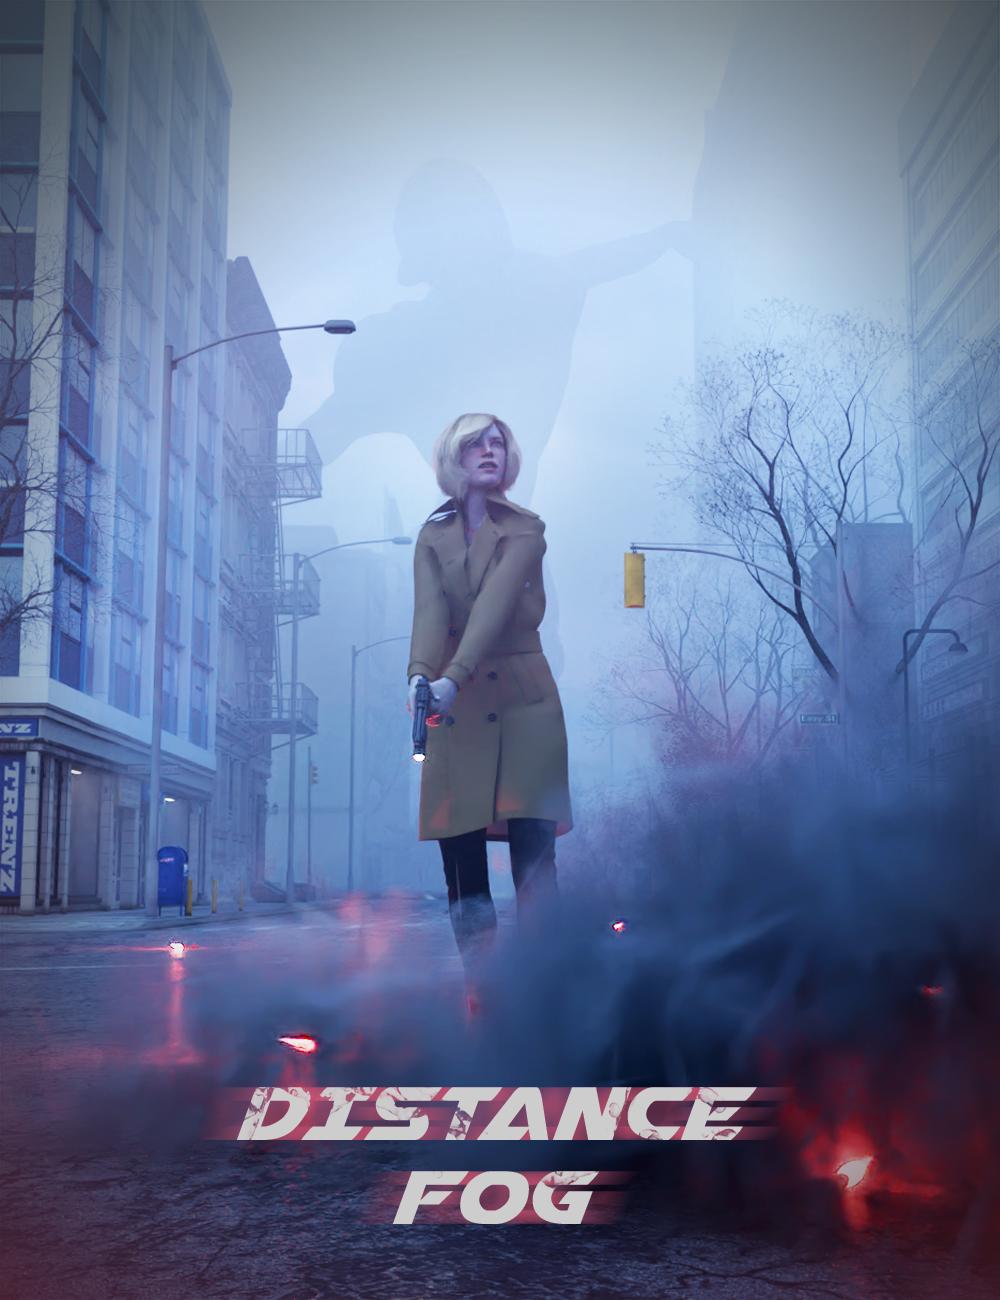 Iray Distance Fog by: KindredArts, 3D Models by Daz 3D